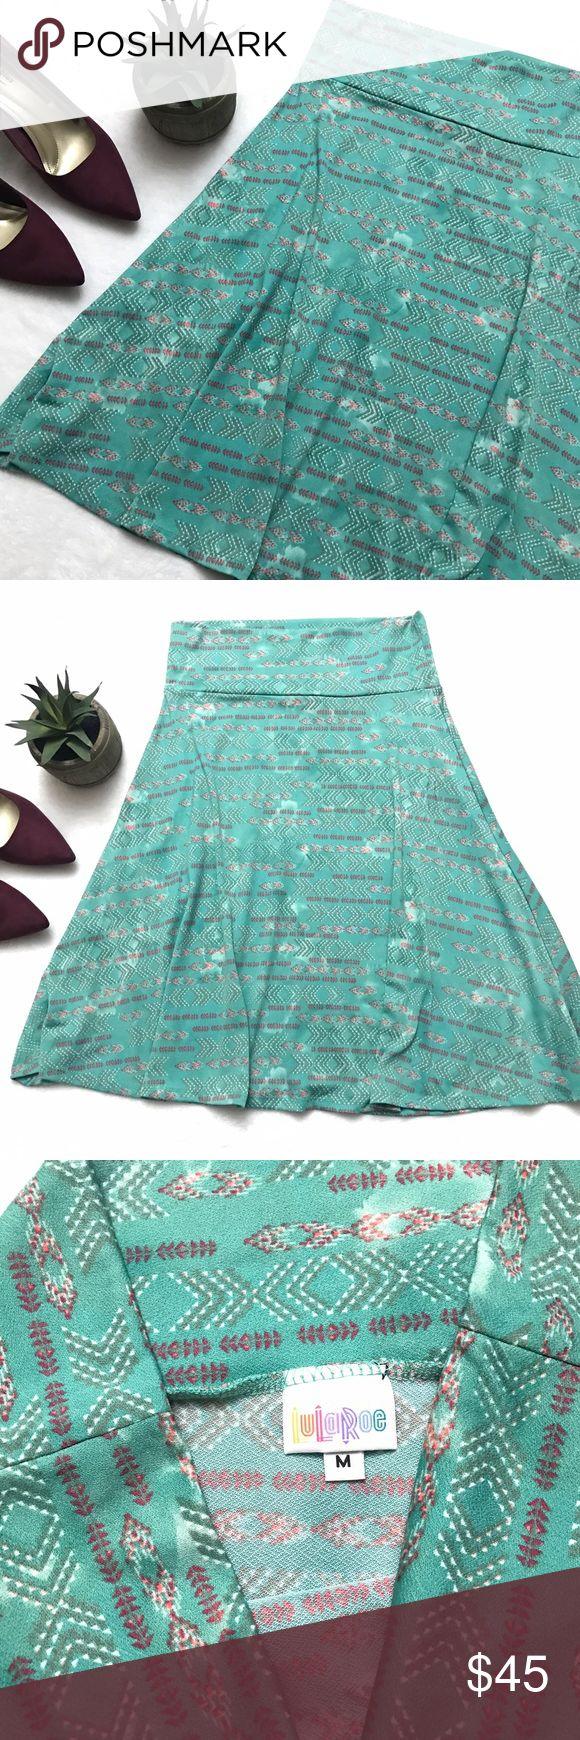 LULAROE Azure Skirt Mint Green Tribal Arrows LULAROE Azure Skirt Mint Green Tribal Arrows size medium. Excellent condition- like new! LuLaRoe Skirts